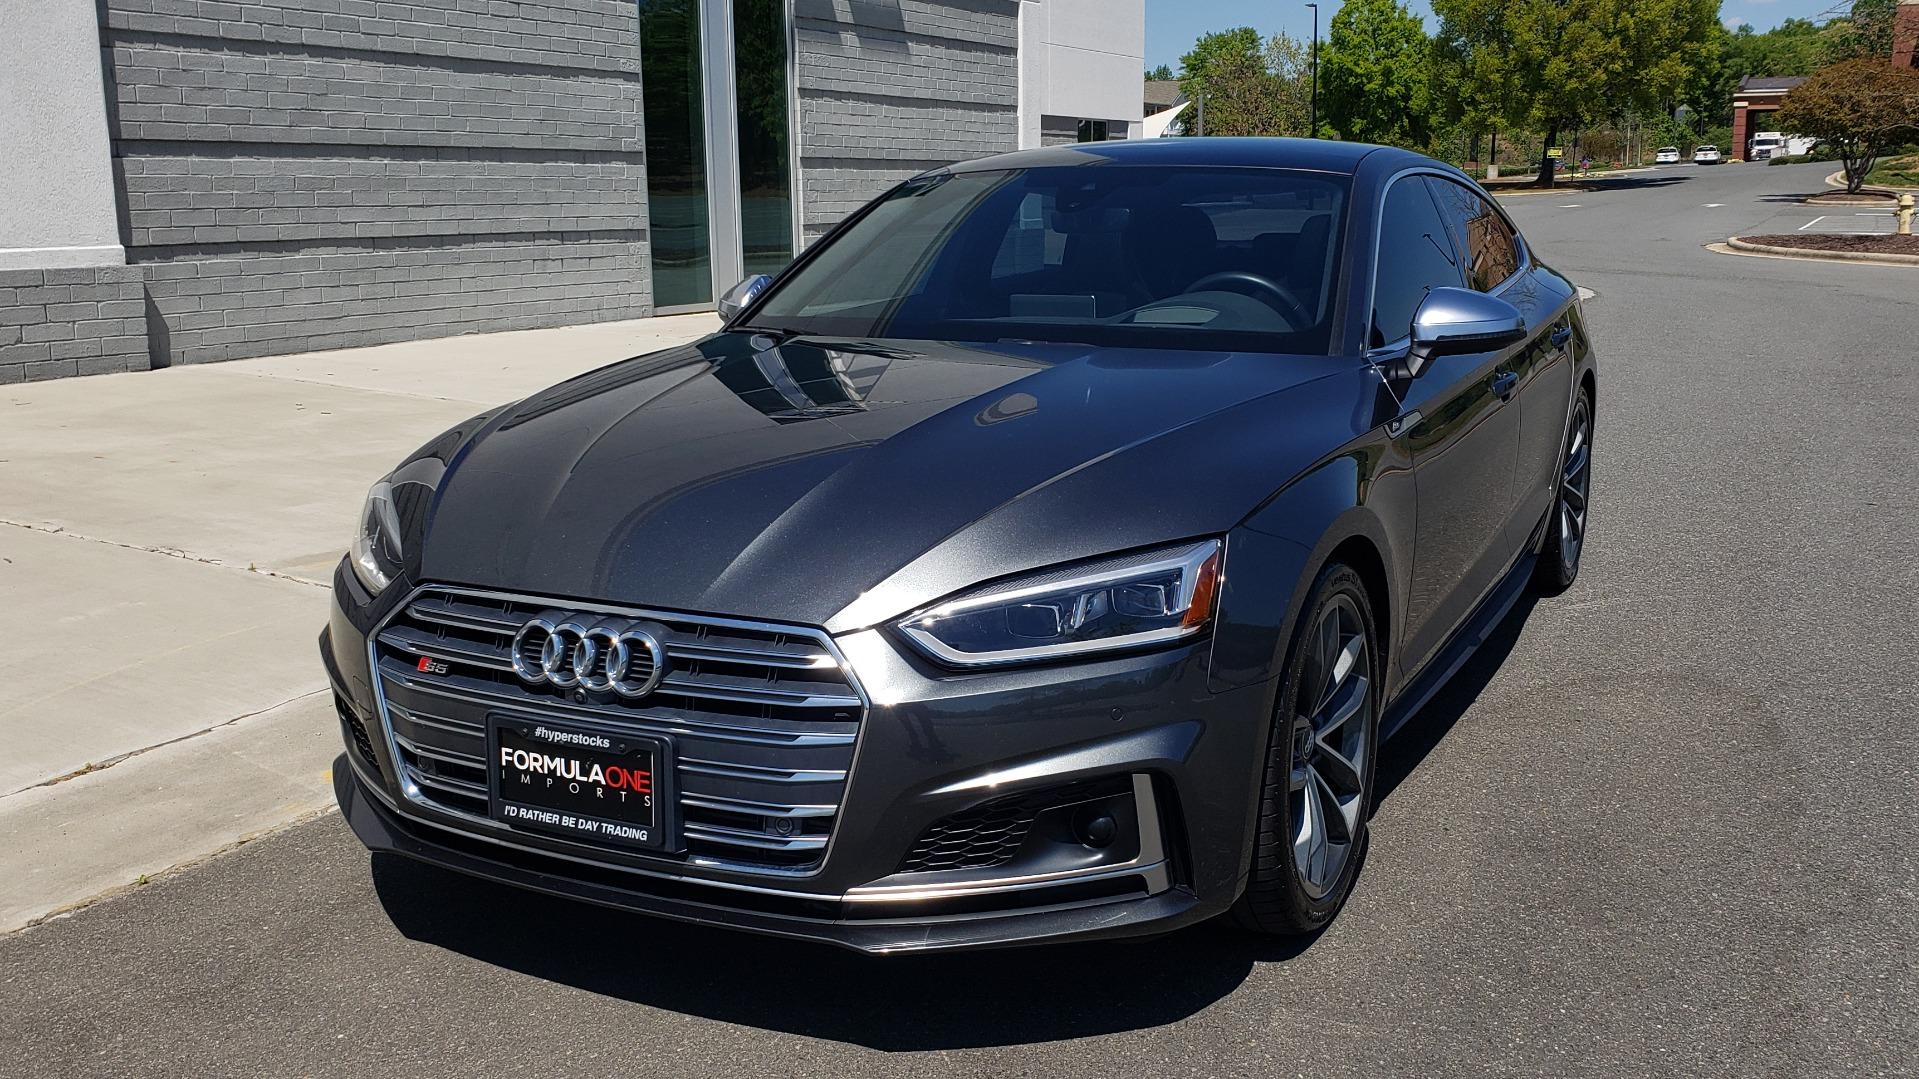 Used 2018 Audi S5 SPORTBACK PRESTIGE S-SPORT / NAV / SUNROOF / HUD / B&O SND / REARVIEW for sale $48,995 at Formula Imports in Charlotte NC 28227 1